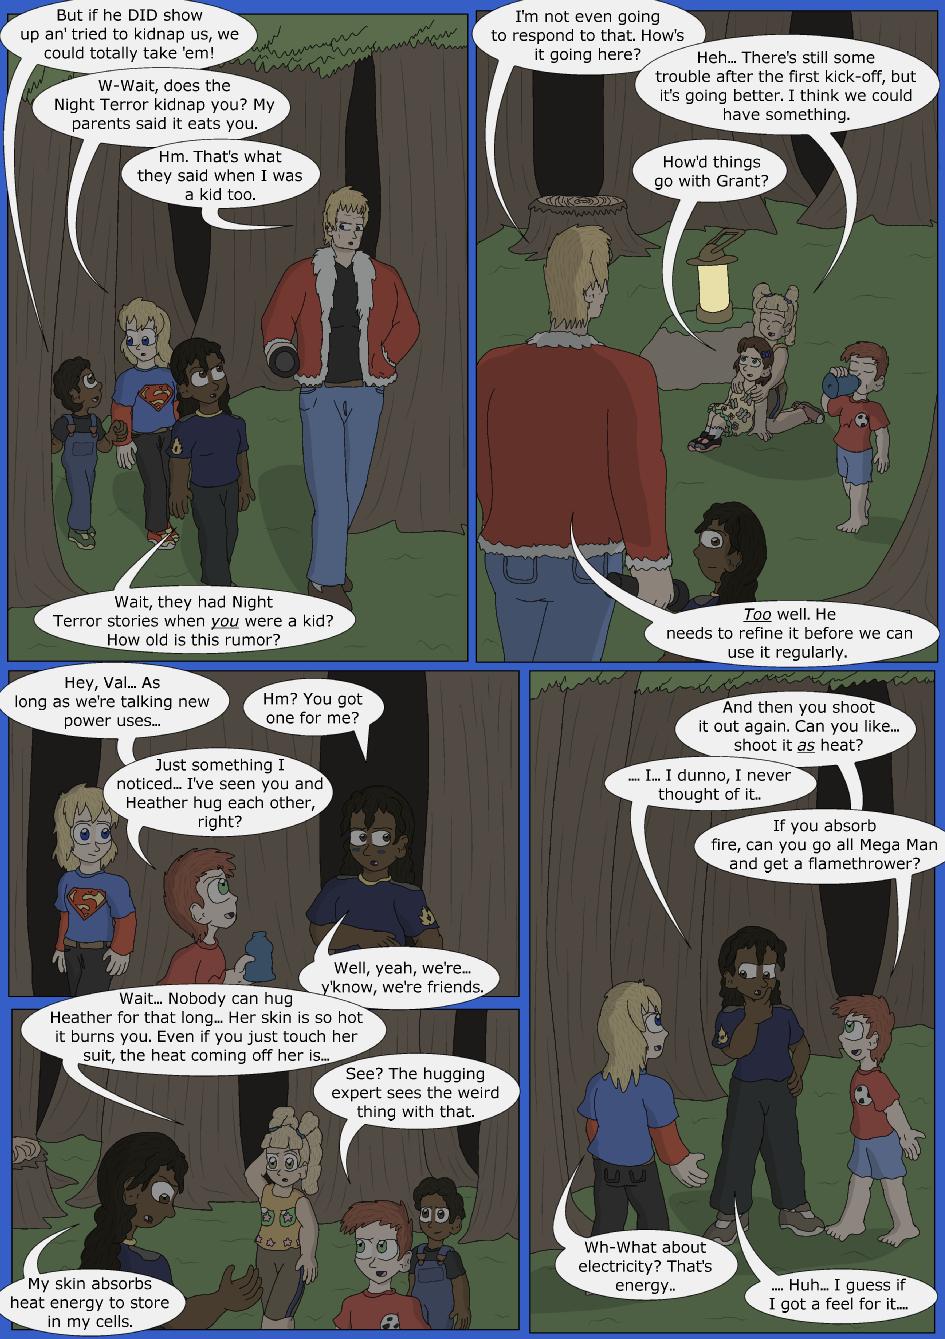 Stronger, Faster, Bluer, Page 9er